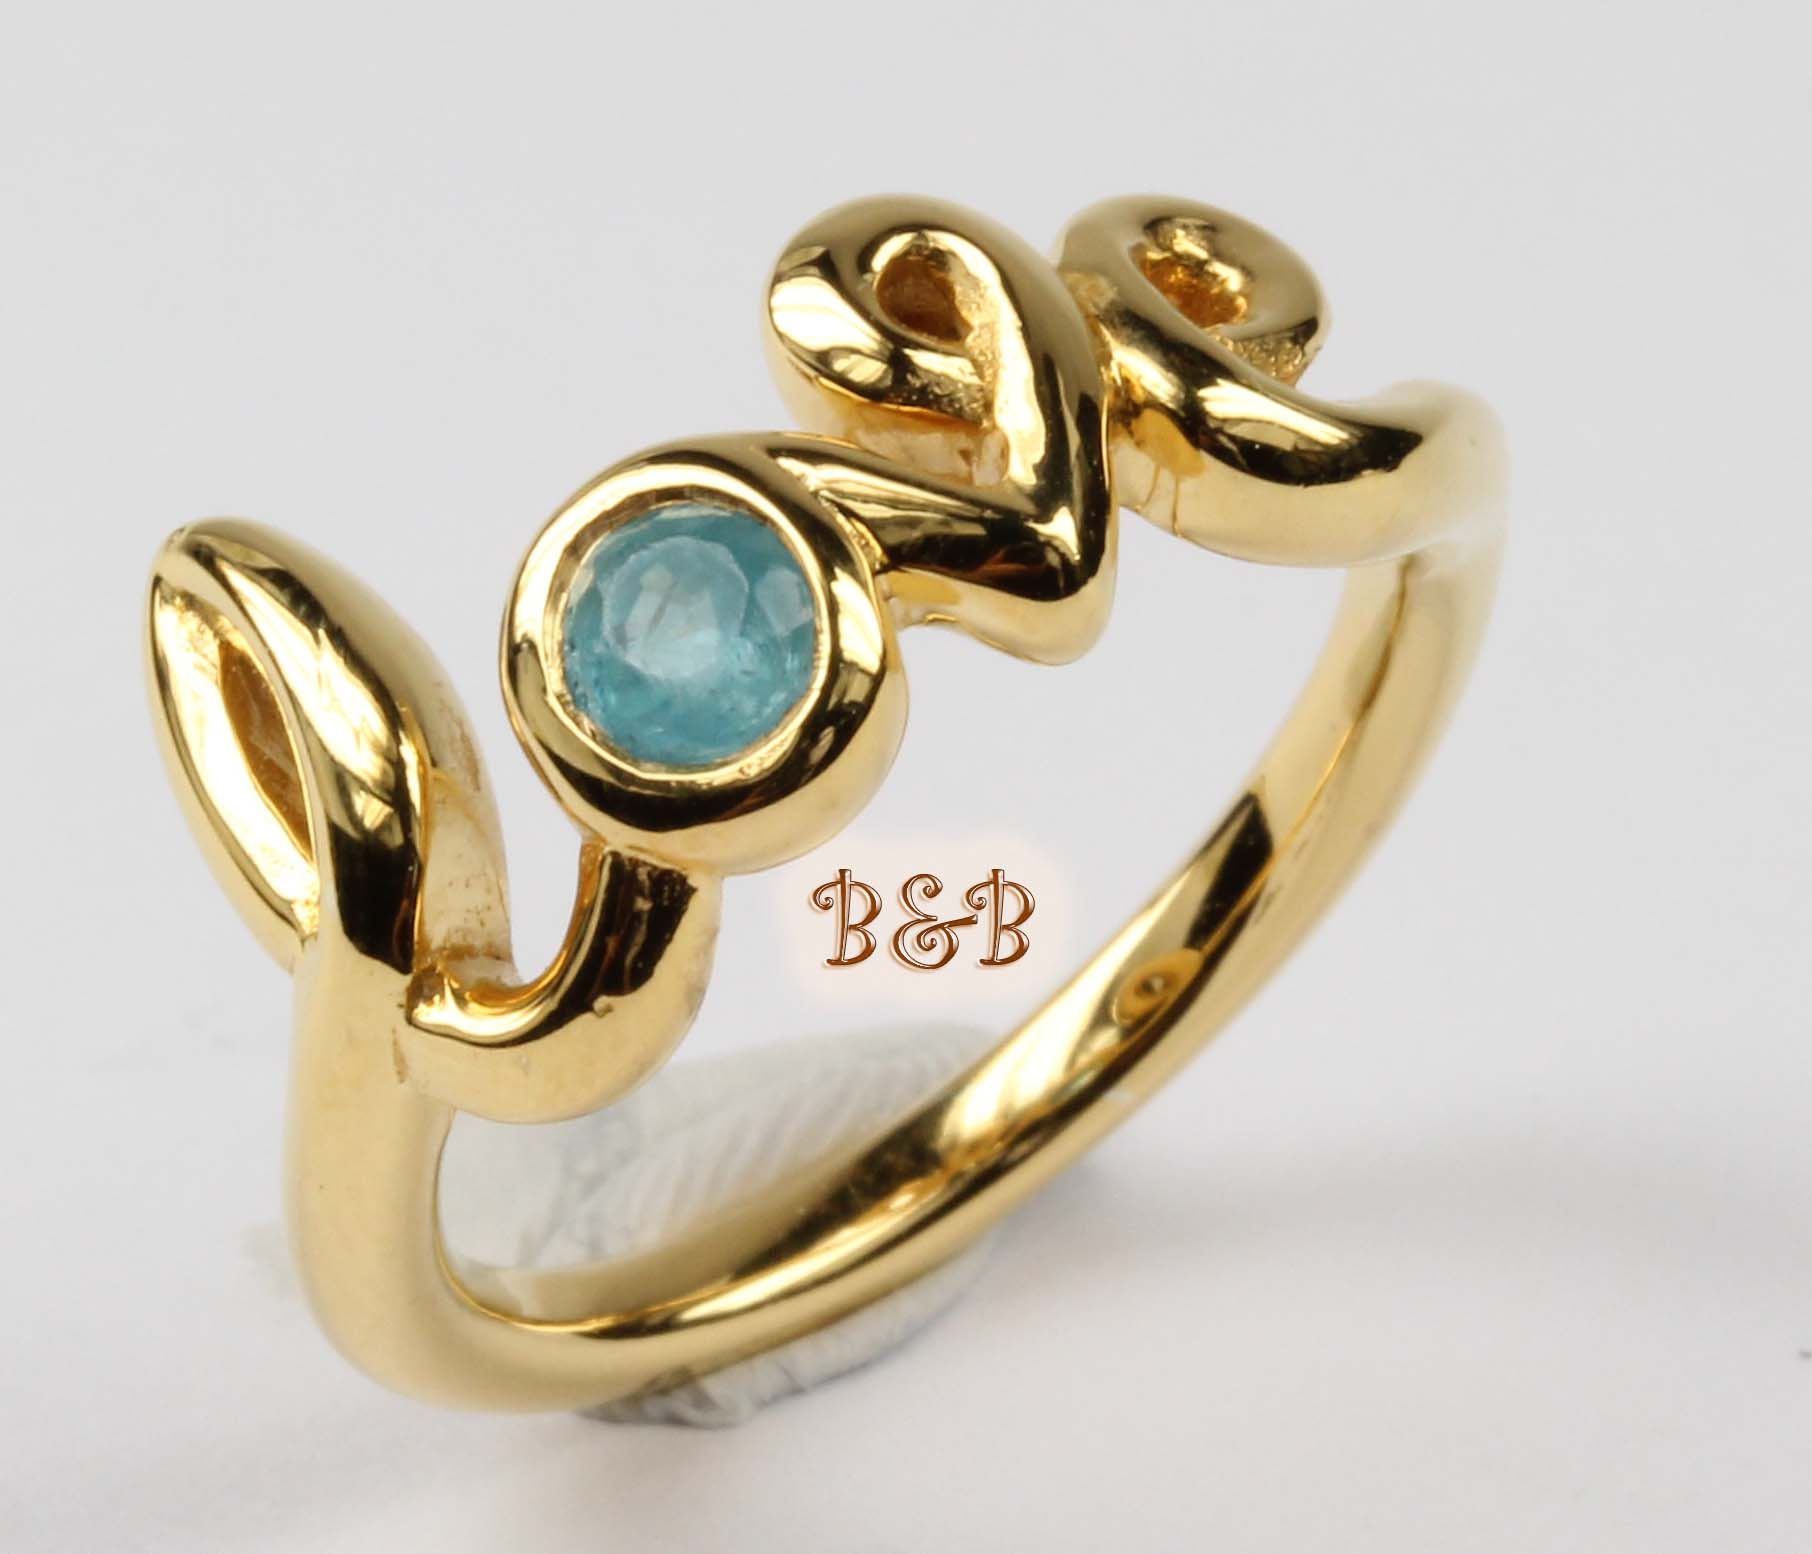 Silver ring_B&B_1710